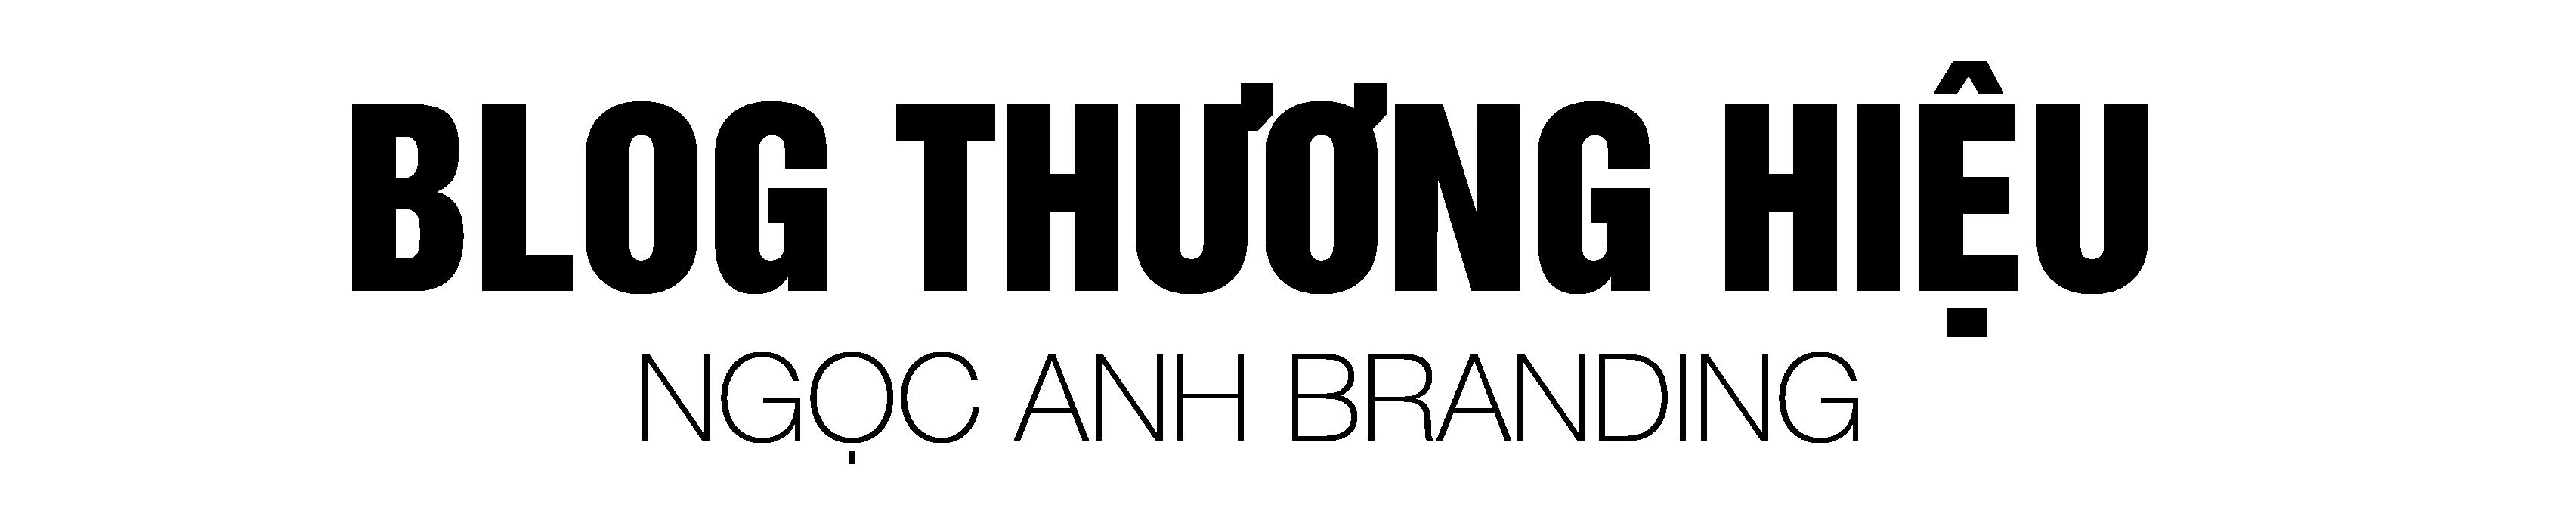 Ngoc Anh Branding